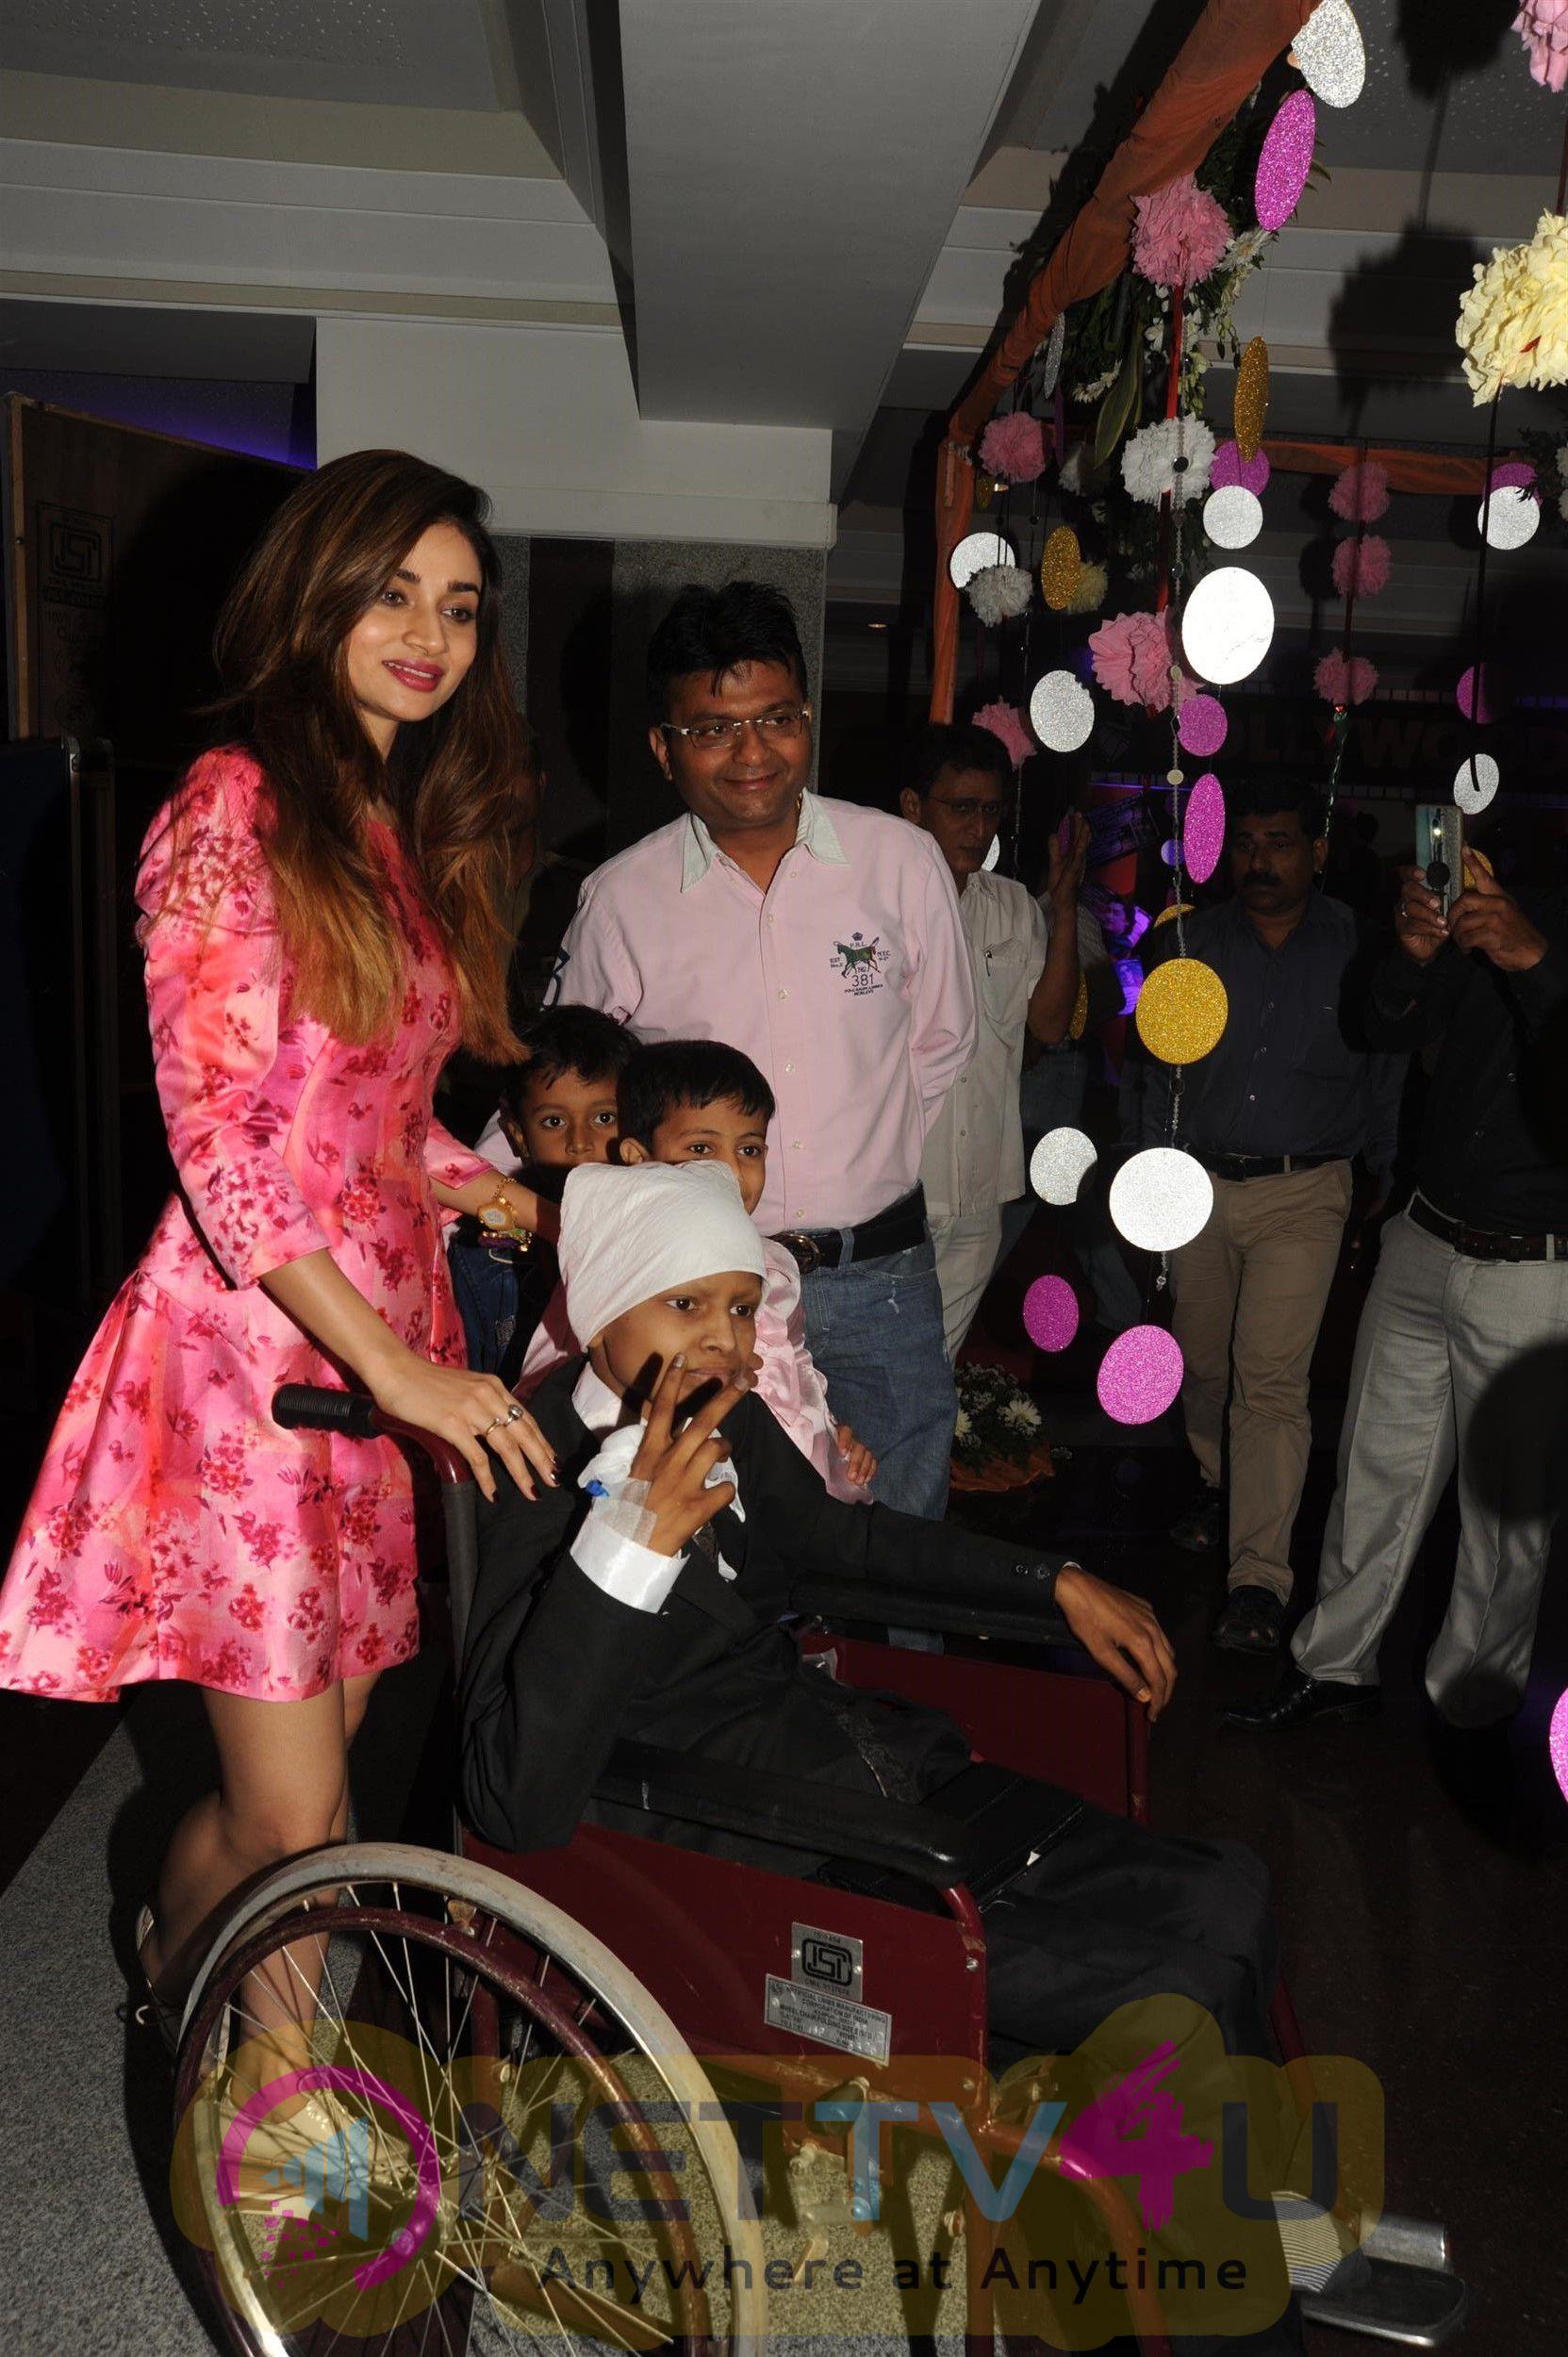 Aditya Roy Kapoor Sonali Bendre, Ganesh Acharya Priya Dutt Celebrate Christmas With Cancer Children Pics